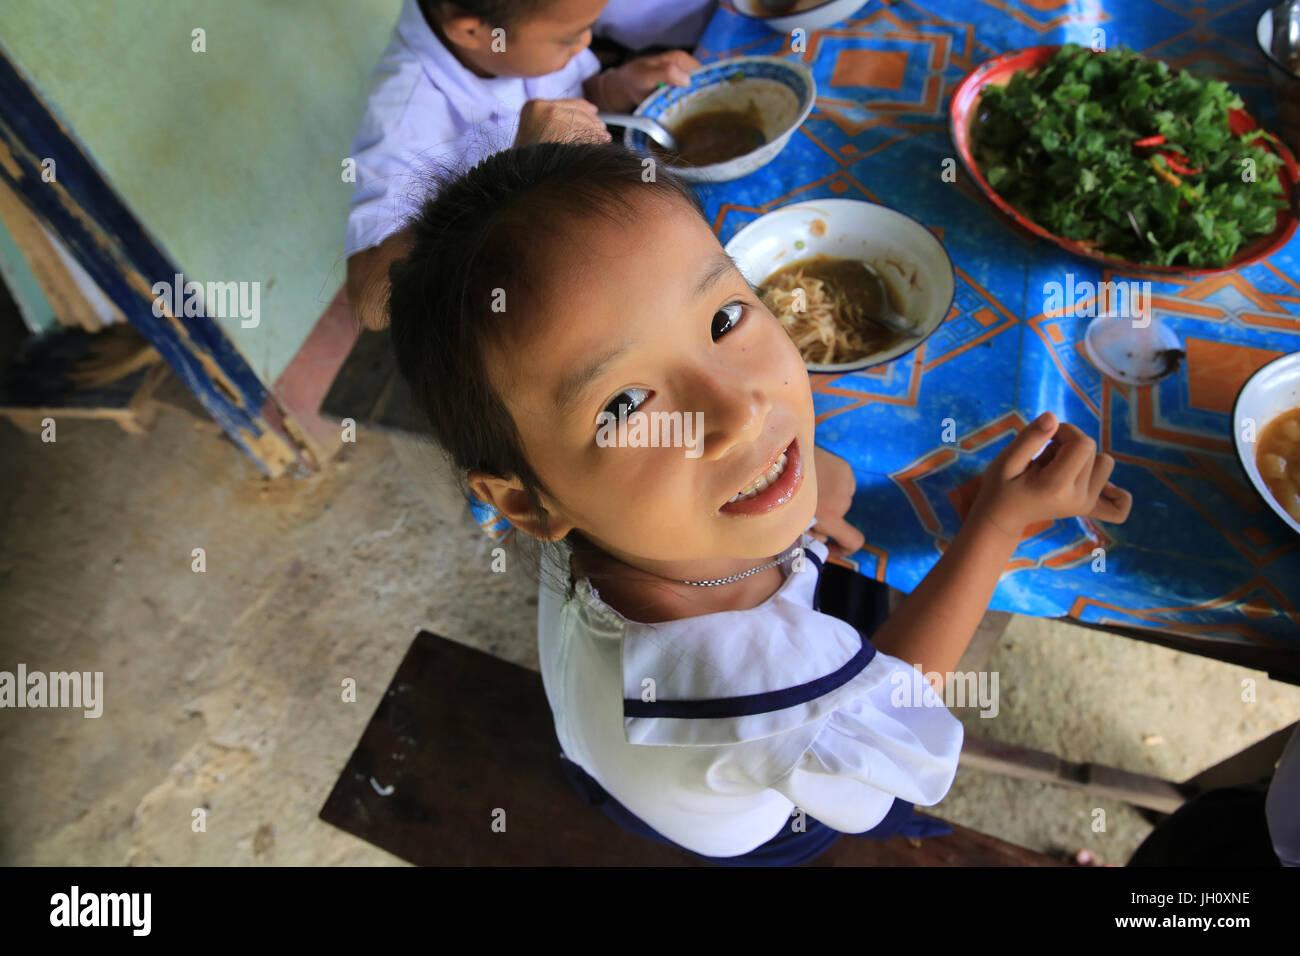 Meal. Laotian schoolgirl.  Laos. - Stock Image